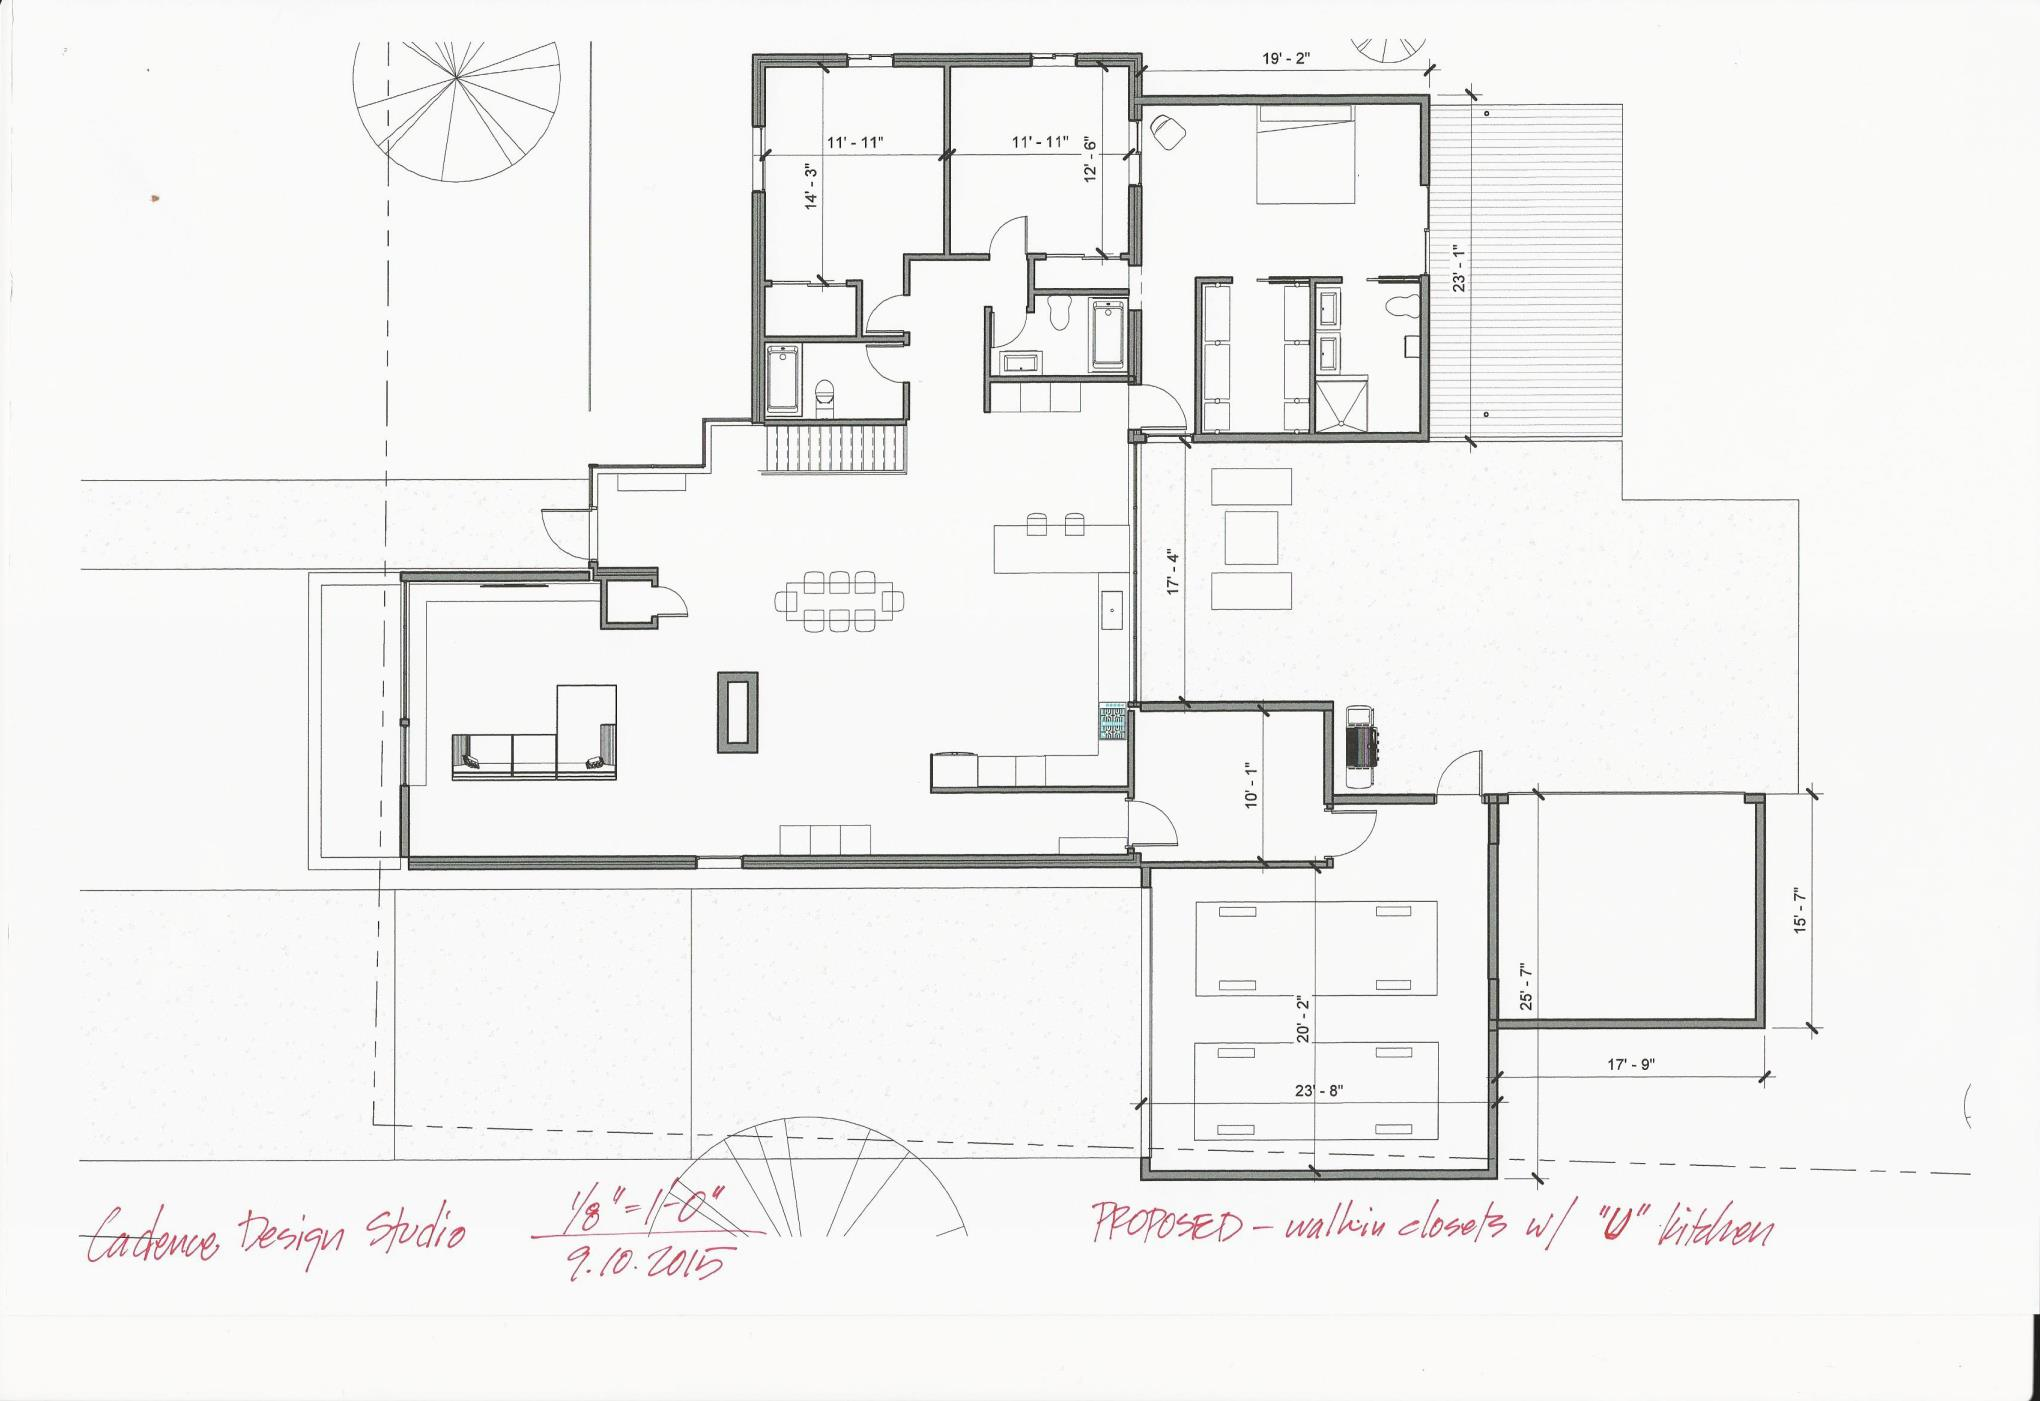 H-D Plan Concepts 20150910 Page 002.jpg